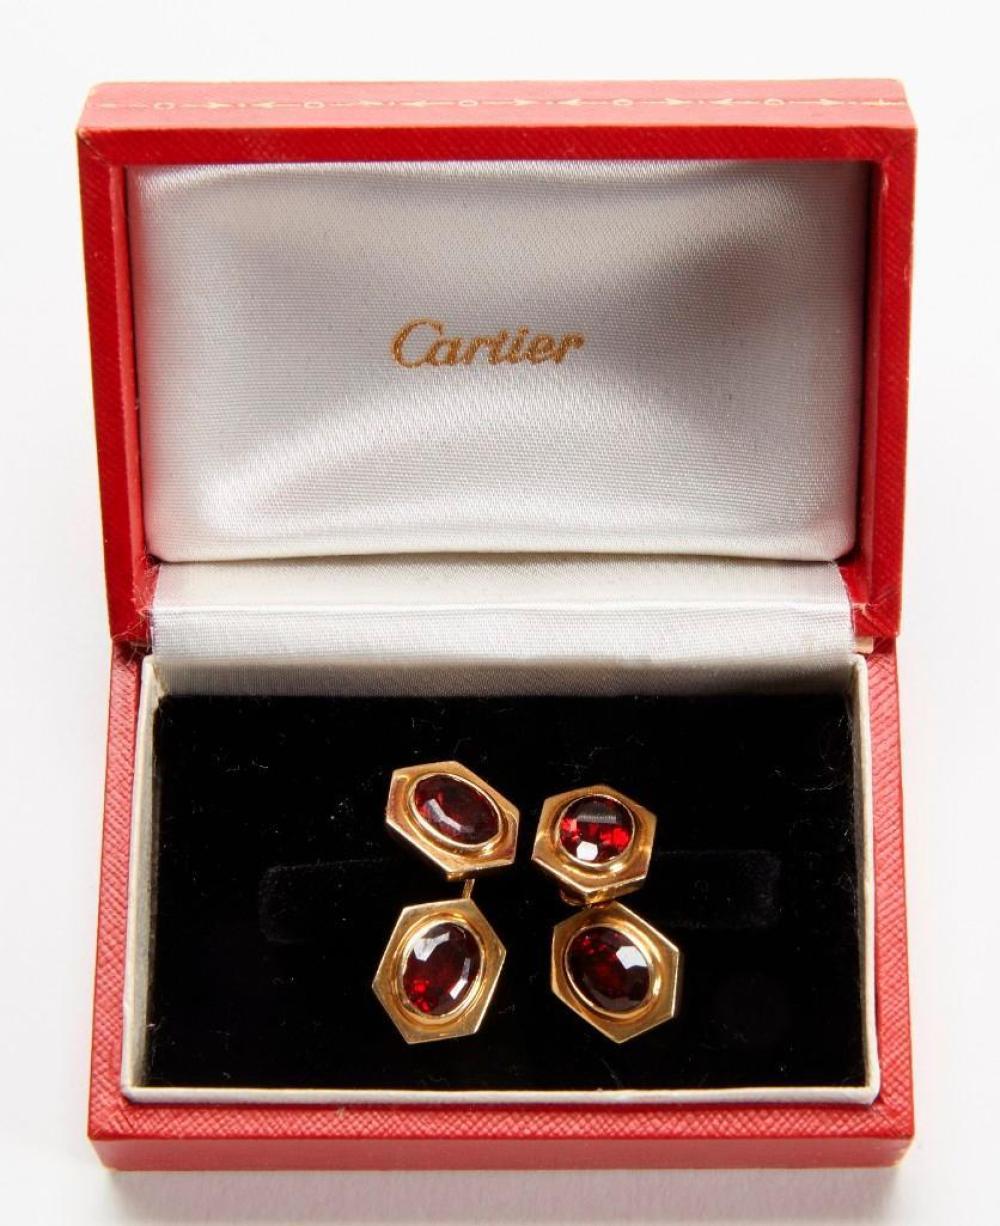 Cartier 18K Gold and Ruby Cufflinks